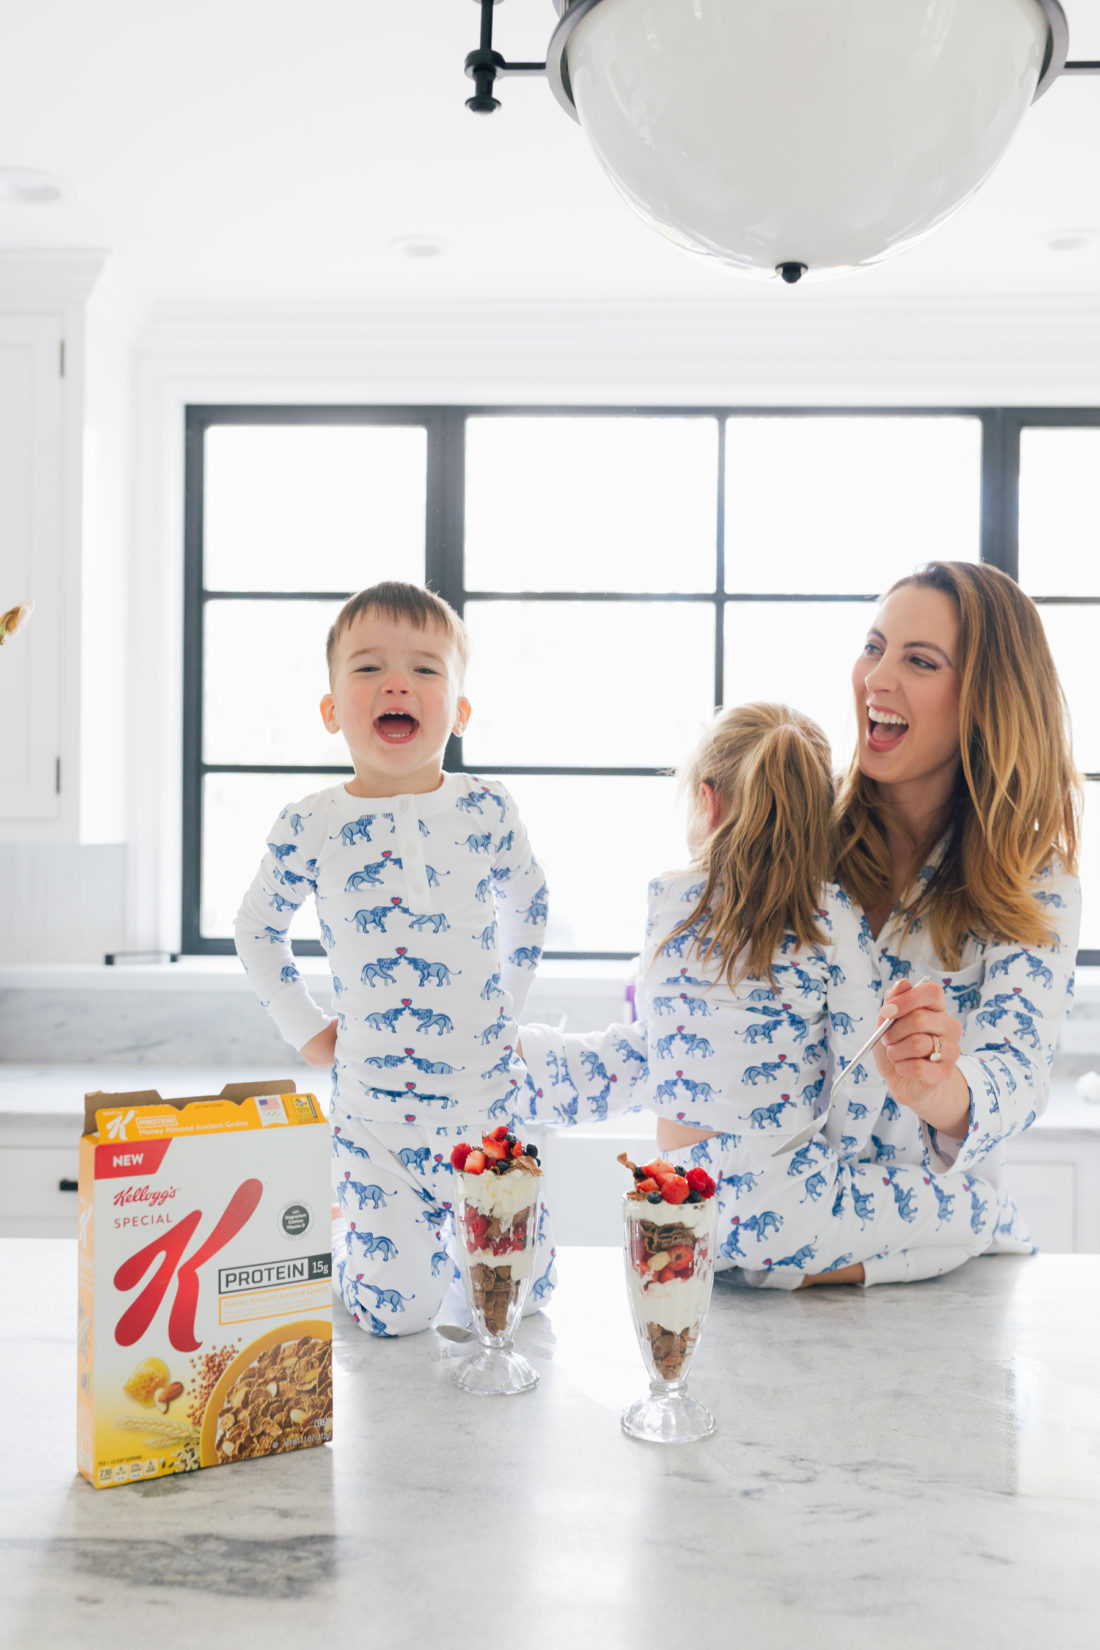 Eva Amurri Martino of Happily Eva After and kids Marlowe and Major enjoy yogurt parfaits for breakfast